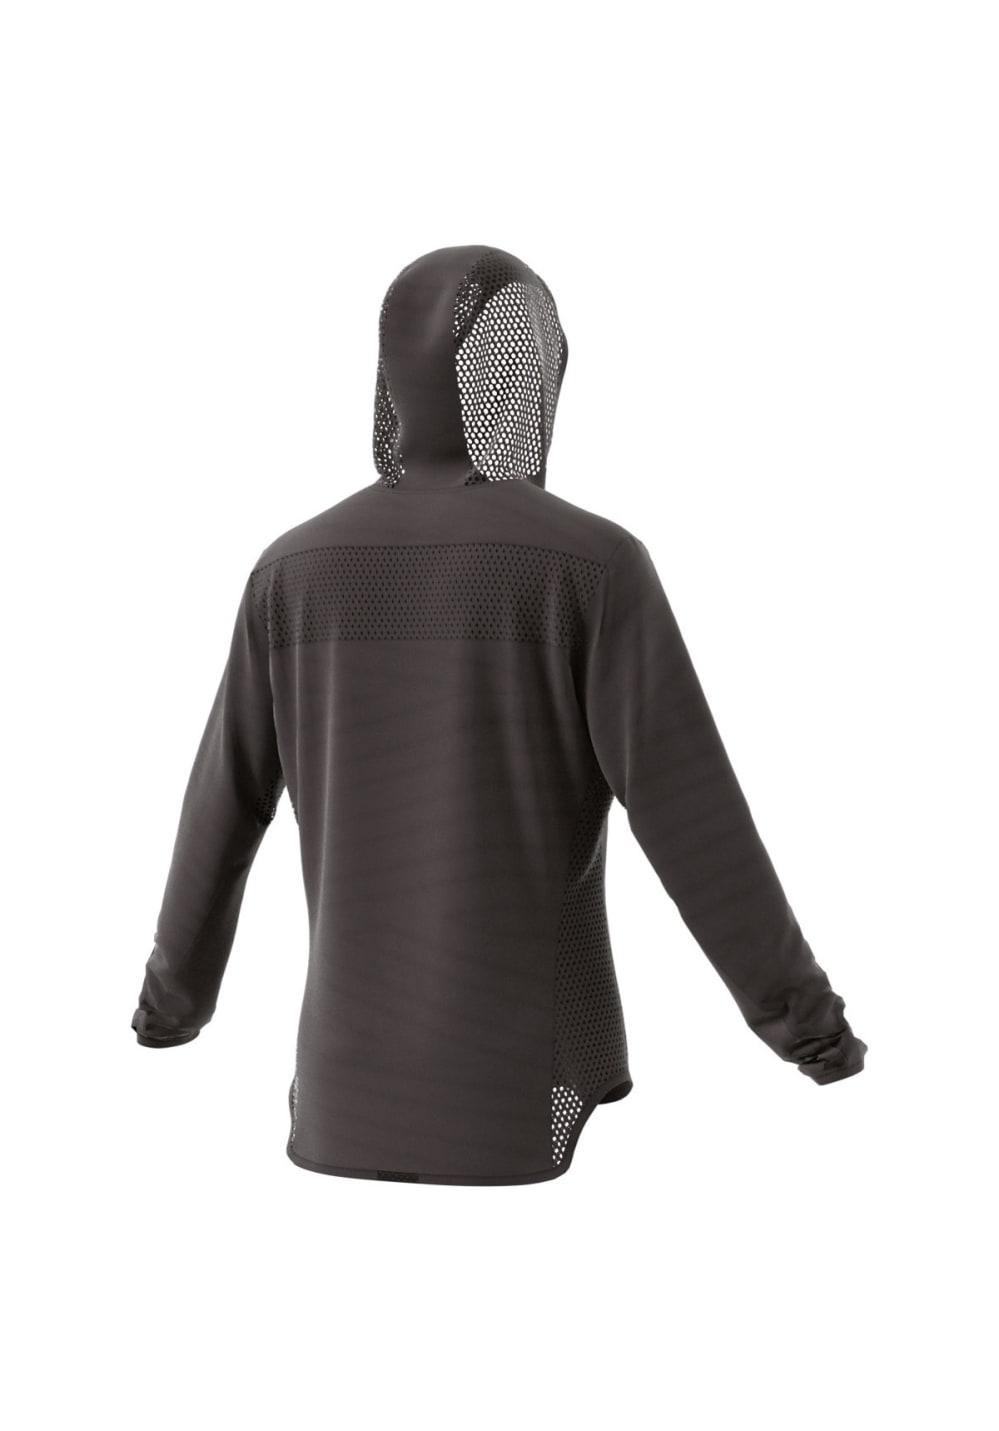 0418d01f8631b Adidas Supernova Tko Flock Print Jacket Running Jackets For Men